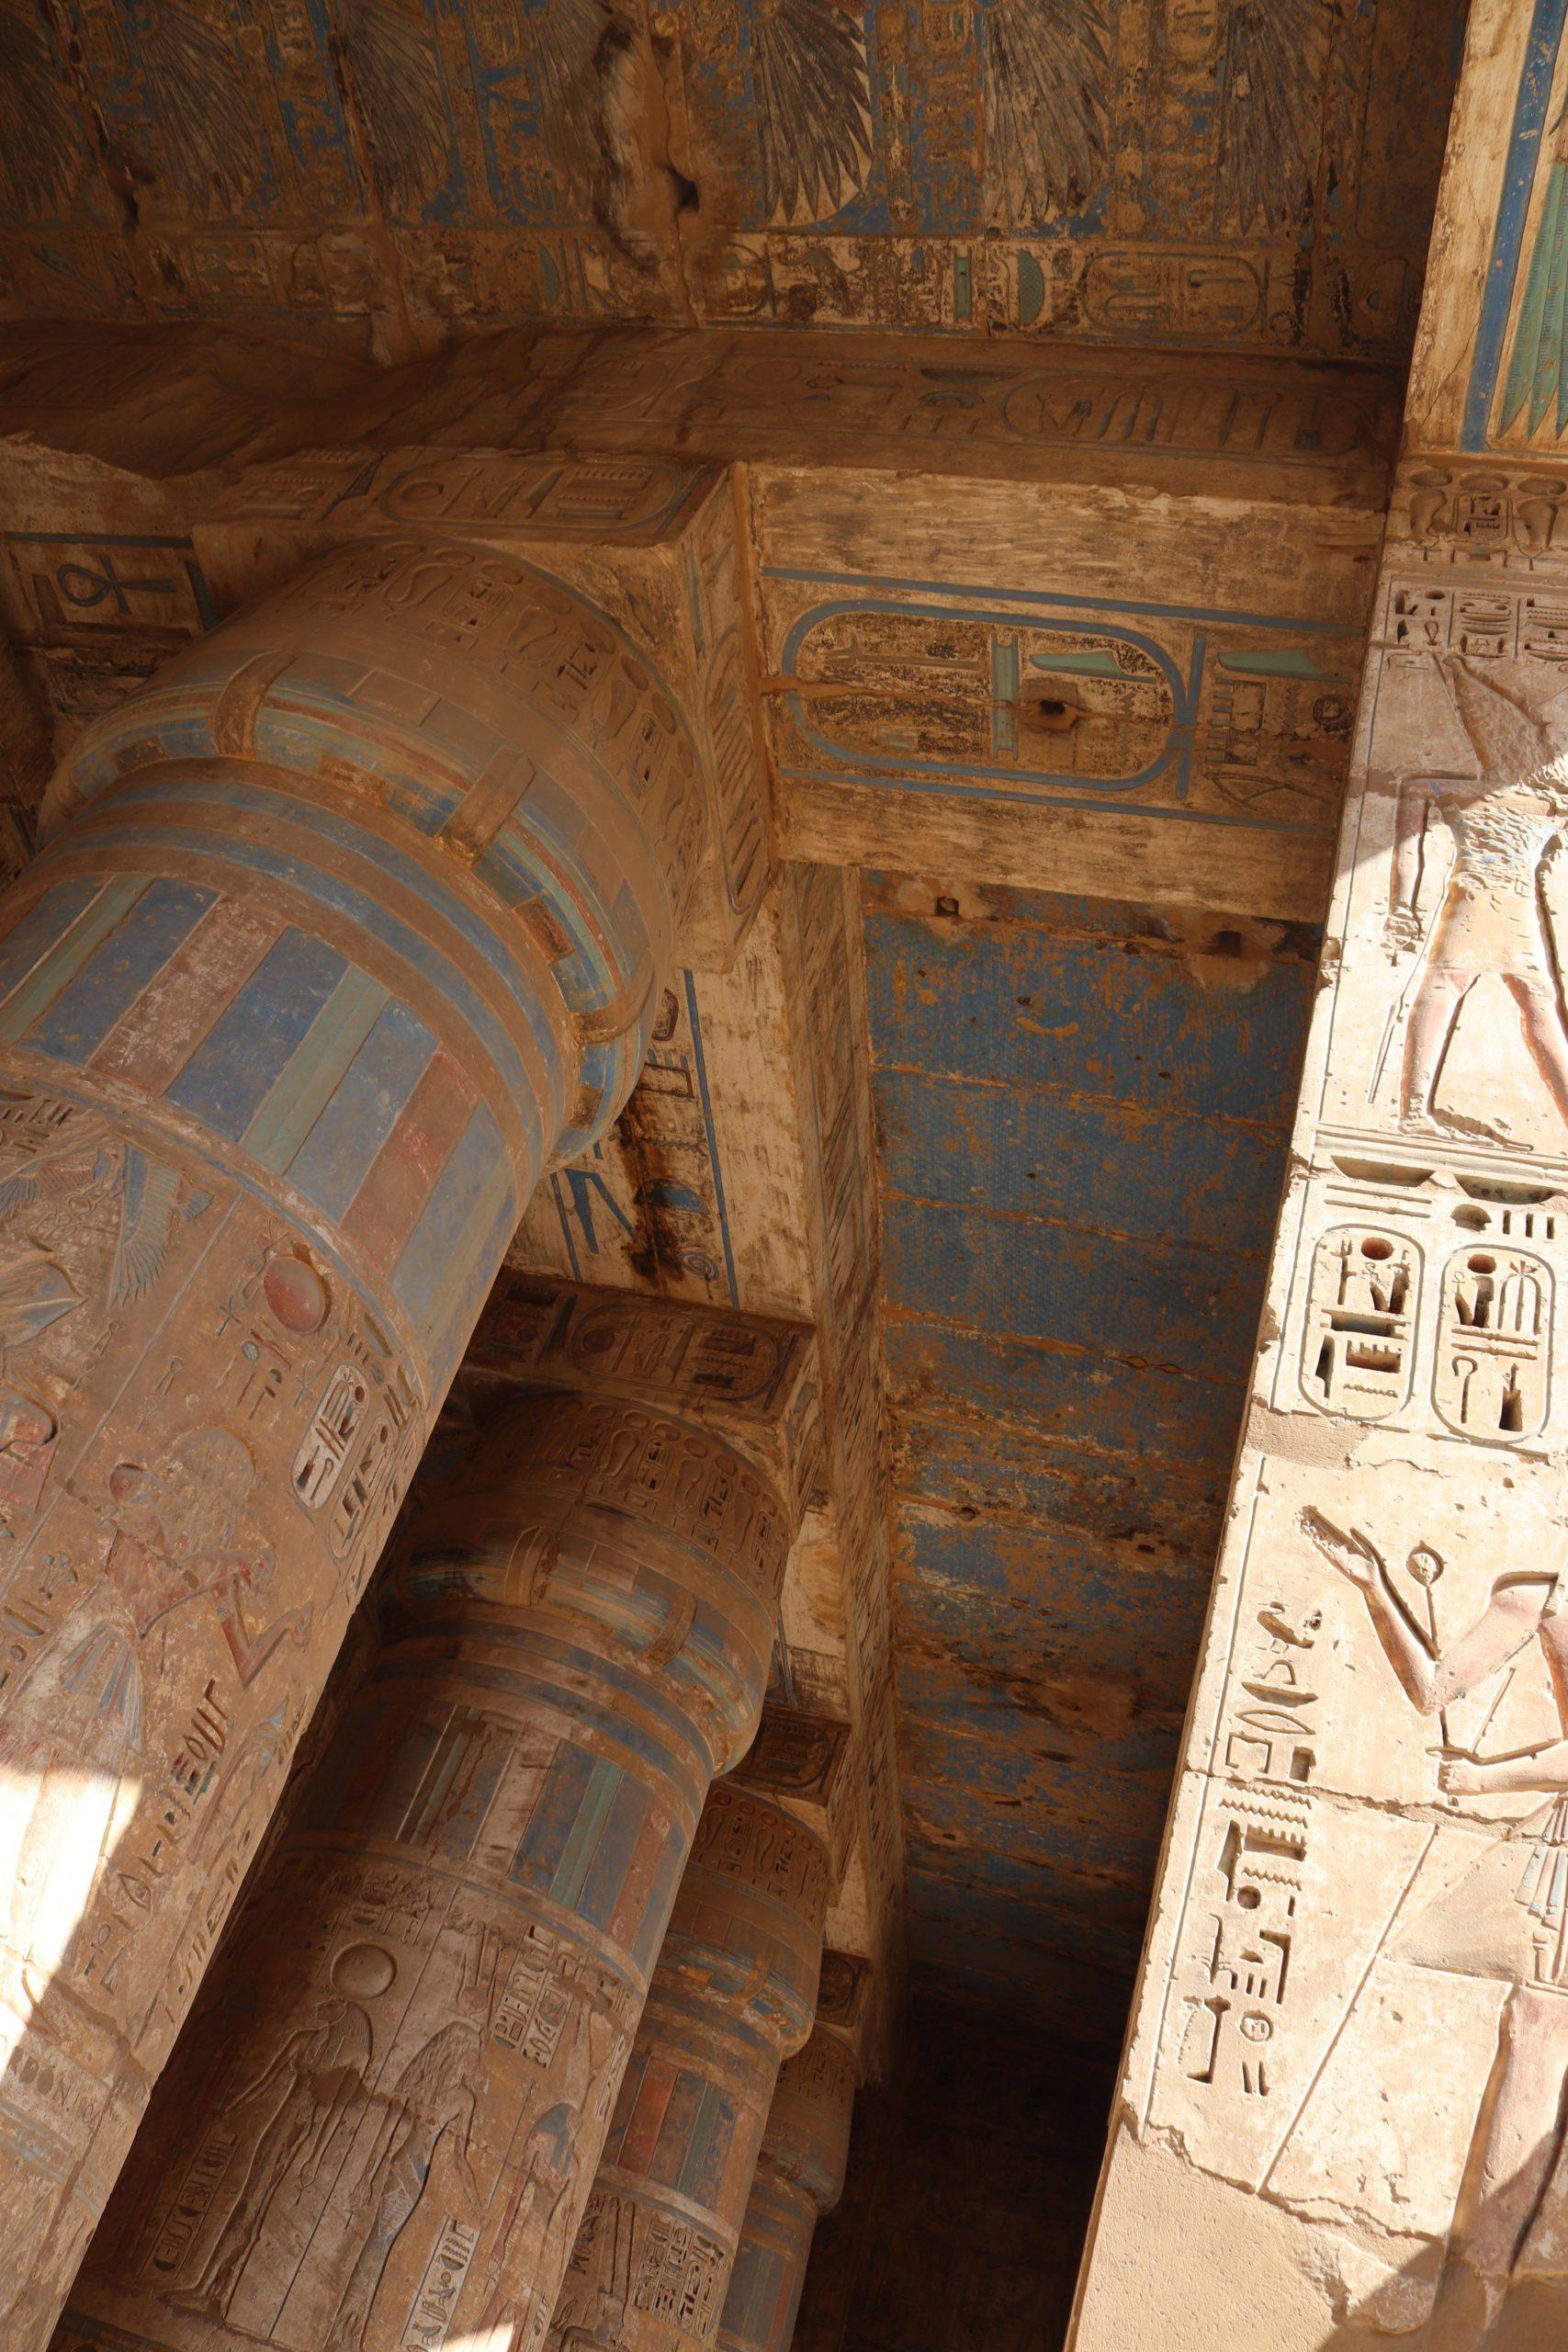 Antiguo Egipto - Templo de Ramsés III en Medinet Habu - Egiptología